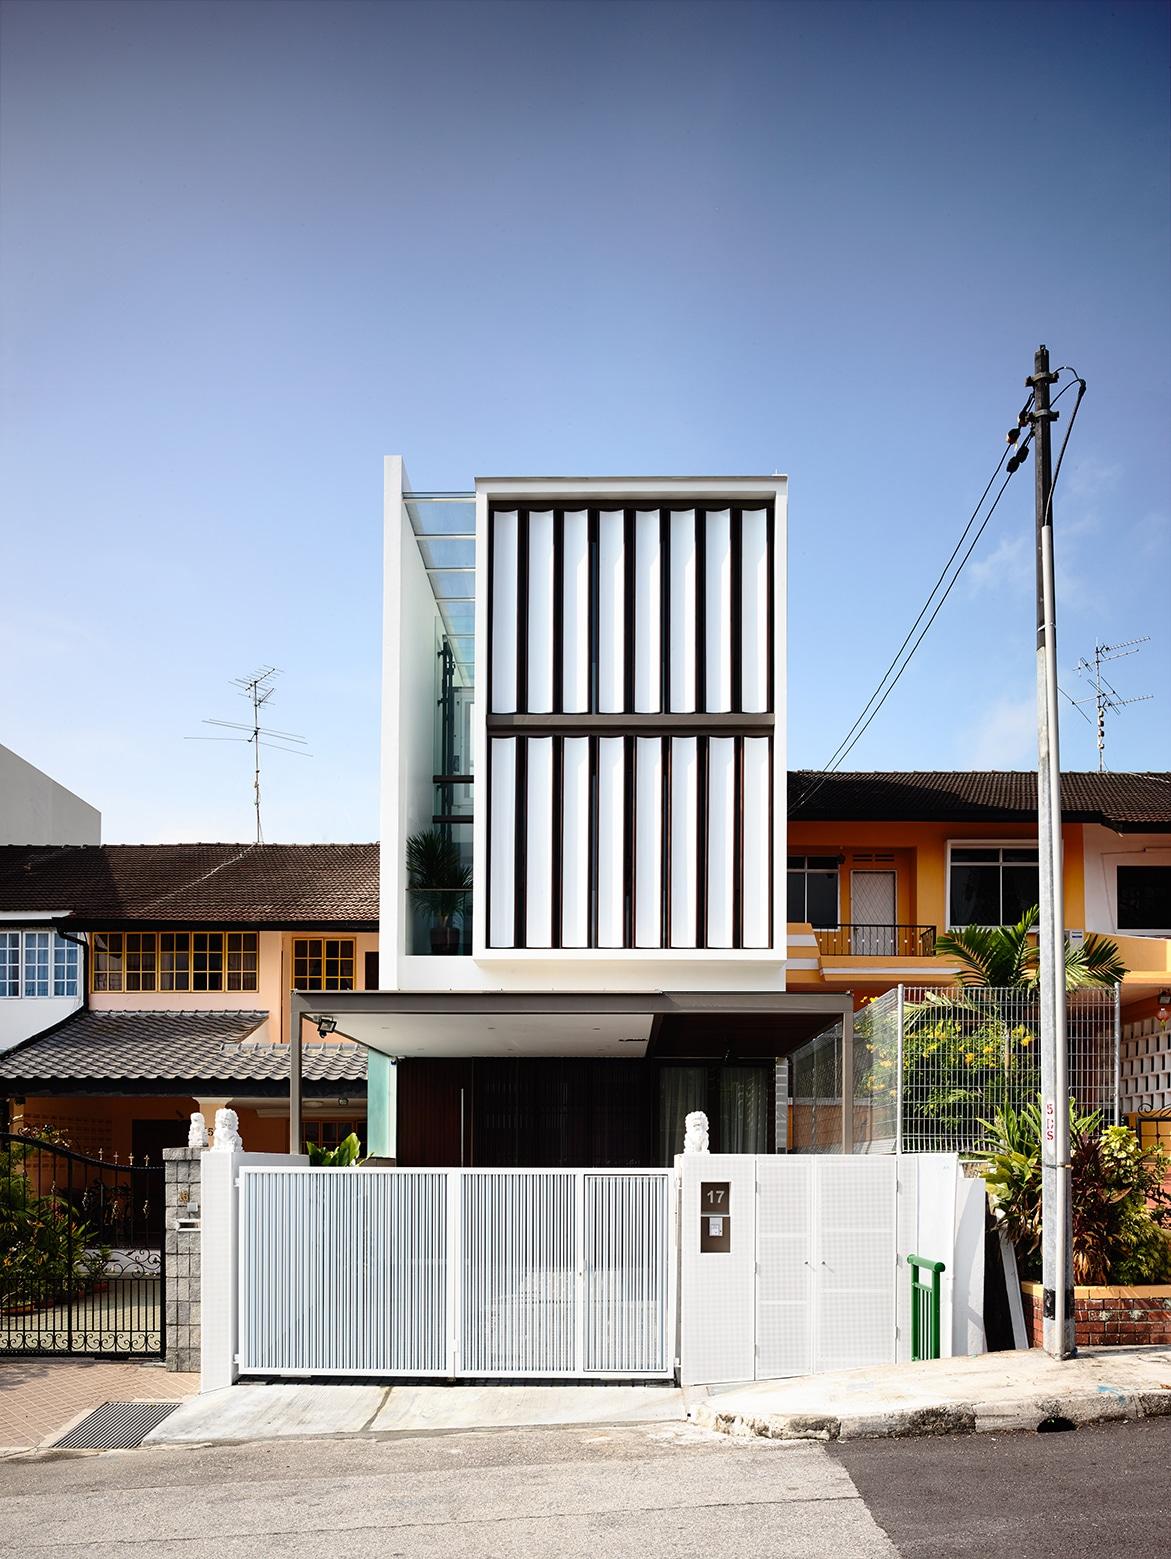 Planos de casa angosta y larga tres pisos construye hogar for Diseno de casas angostas